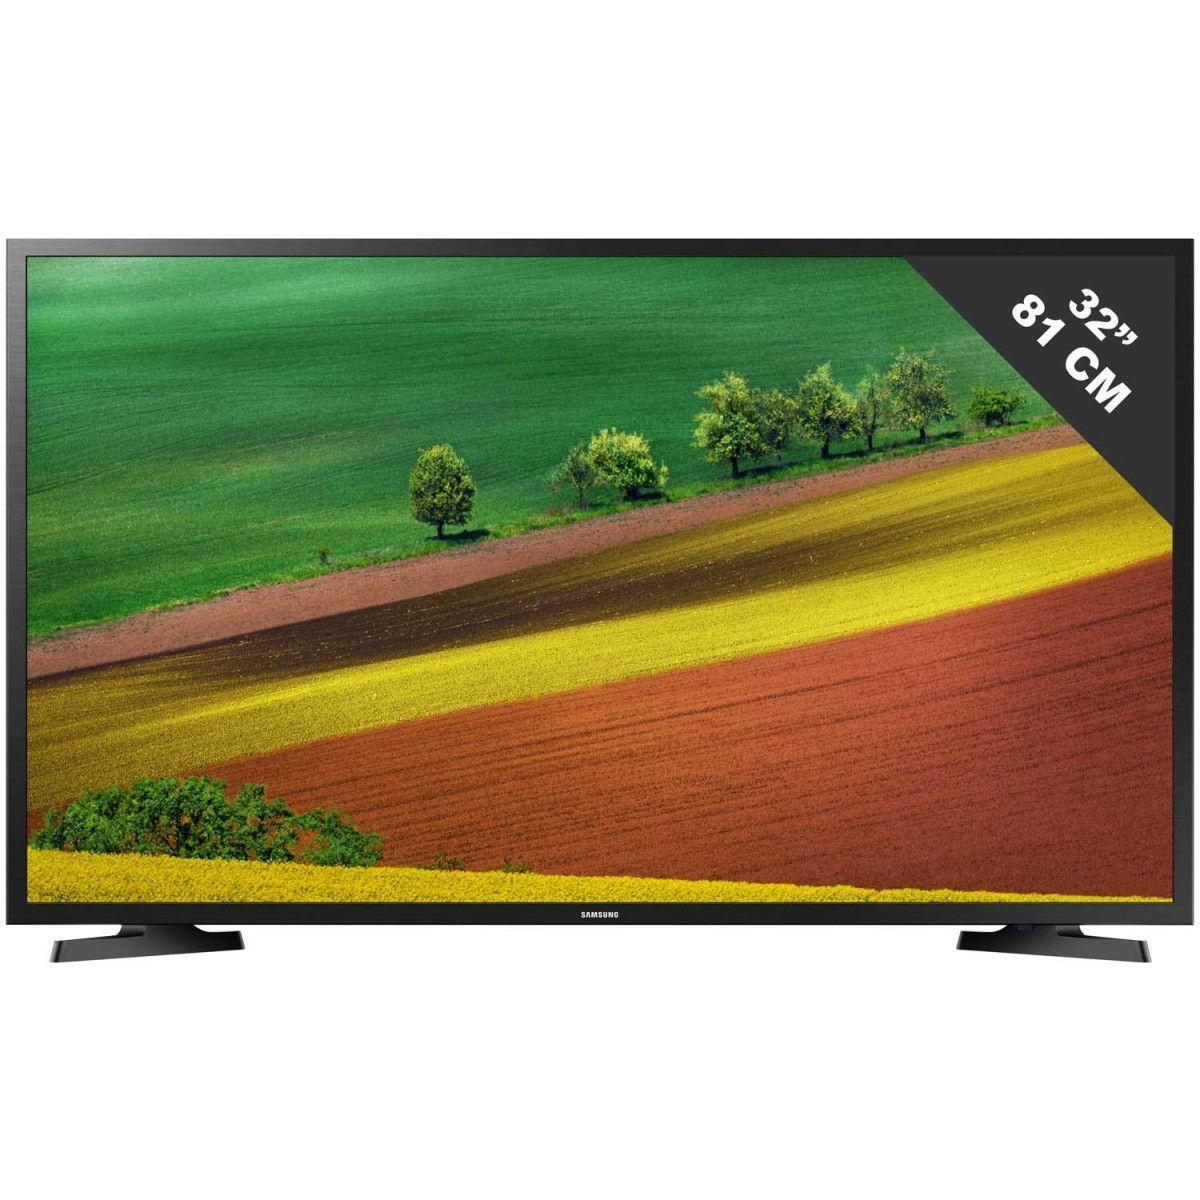 Téléviseur UE 32 N 4005 AWXXC